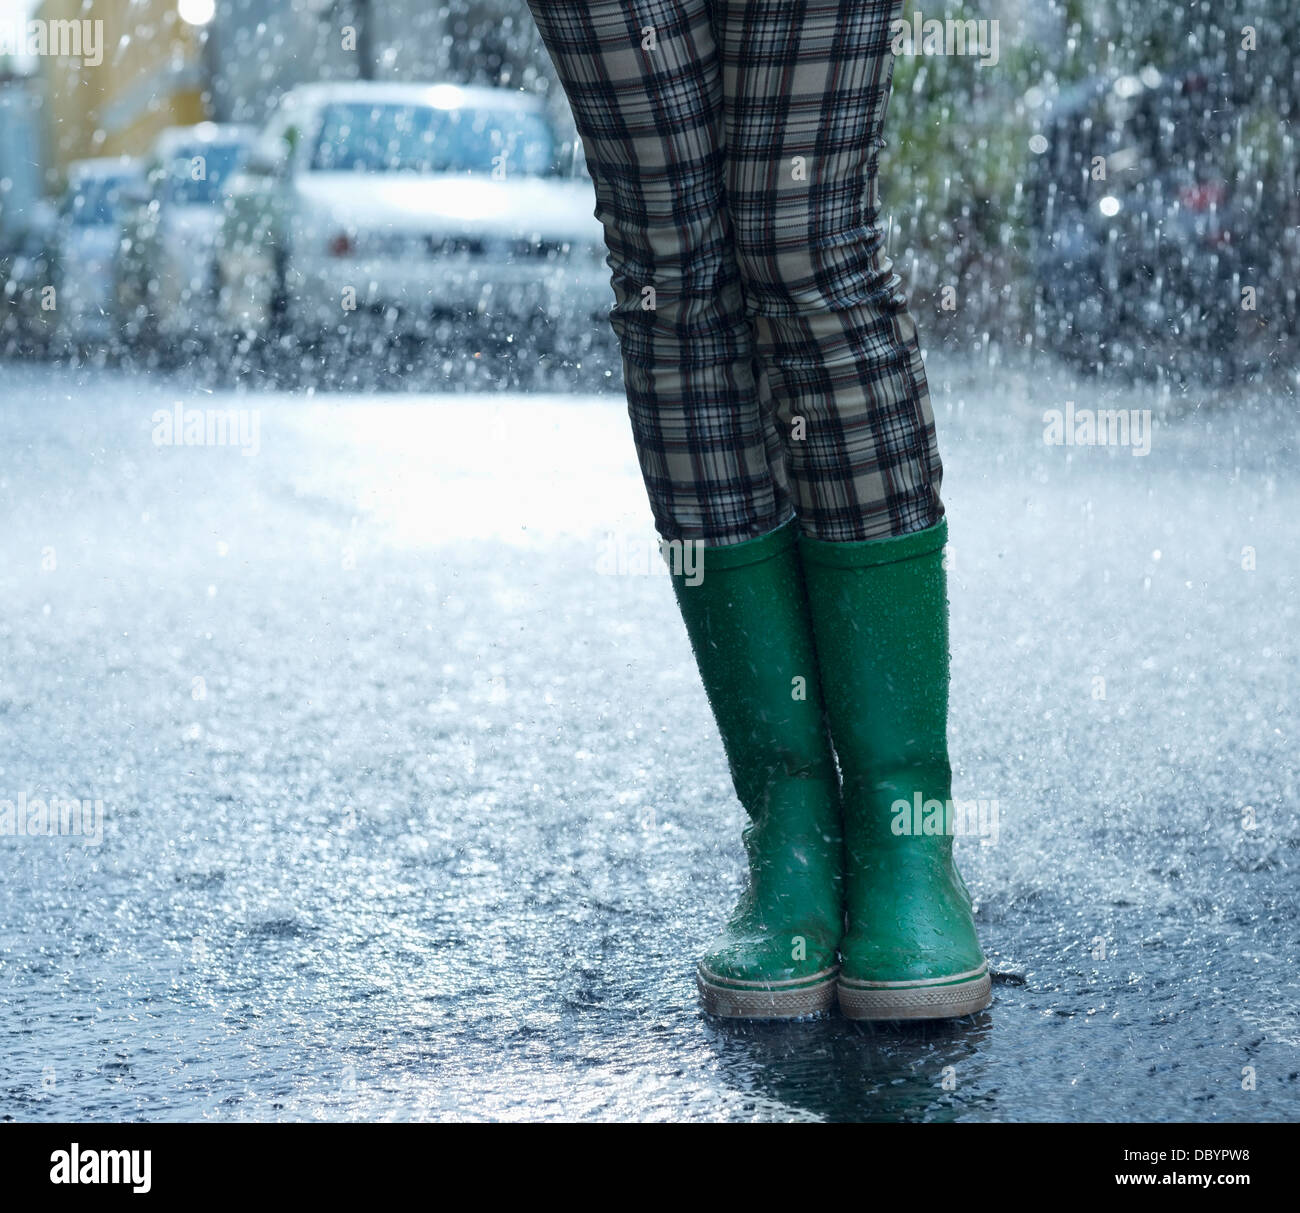 Regen fällt um Frau in Gummistiefel Stockbild